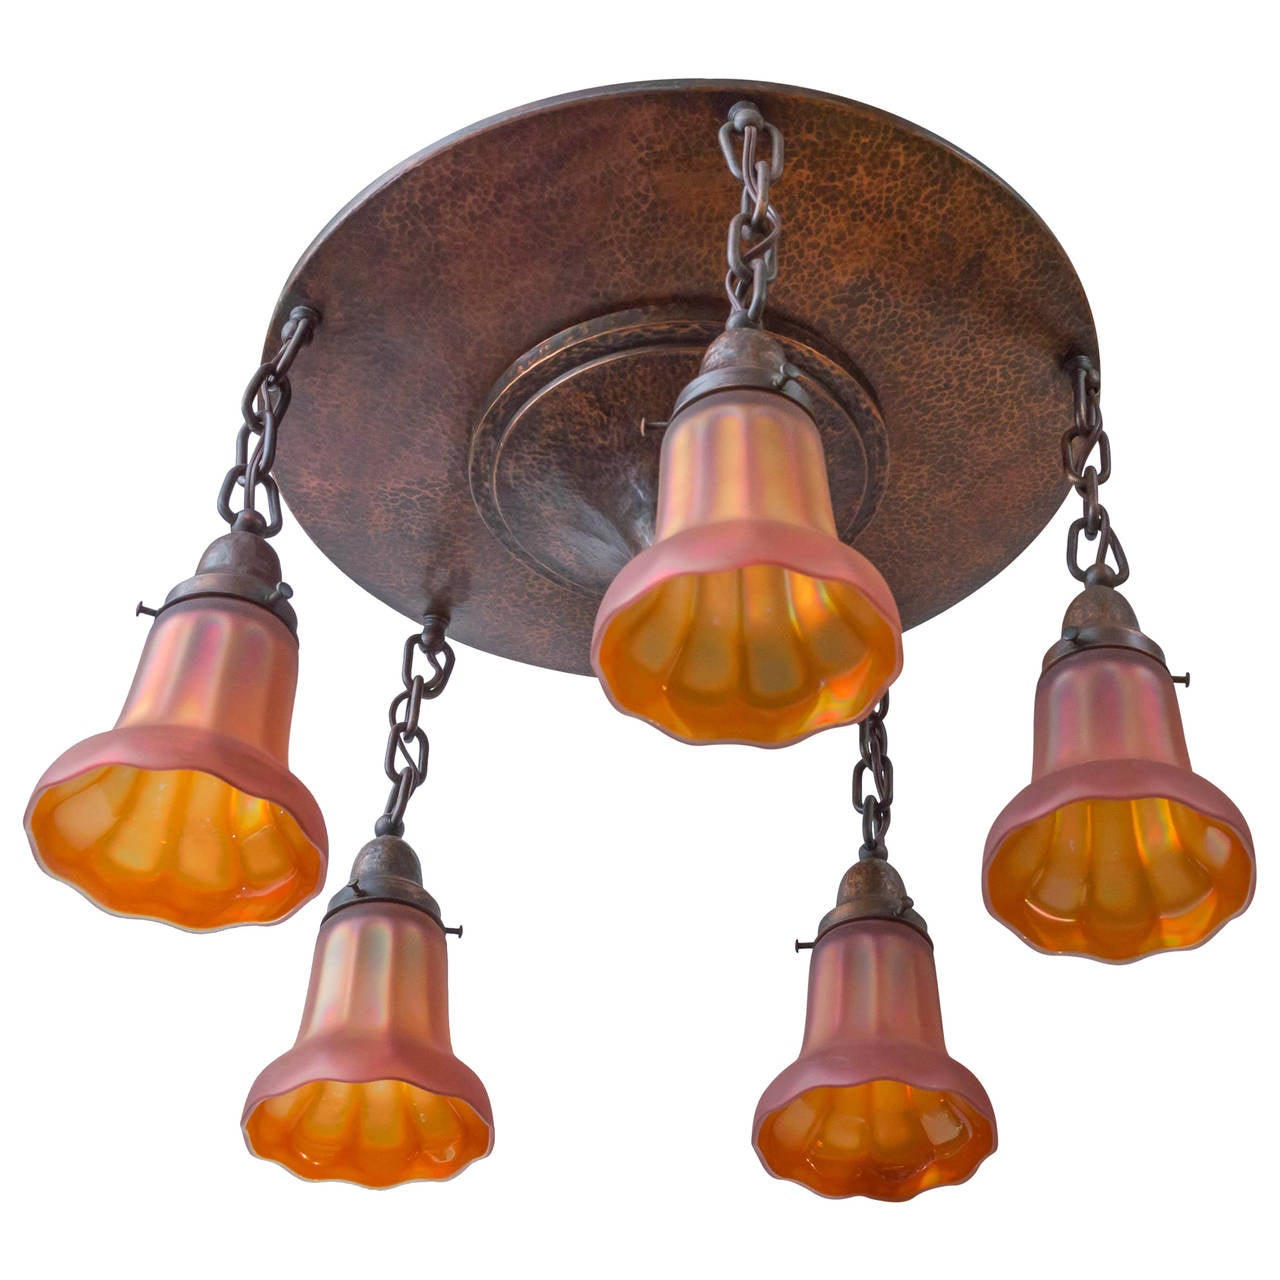 Arts and crafts hammered copper flush mount chandelier for Arts and crafts flush mount lighting